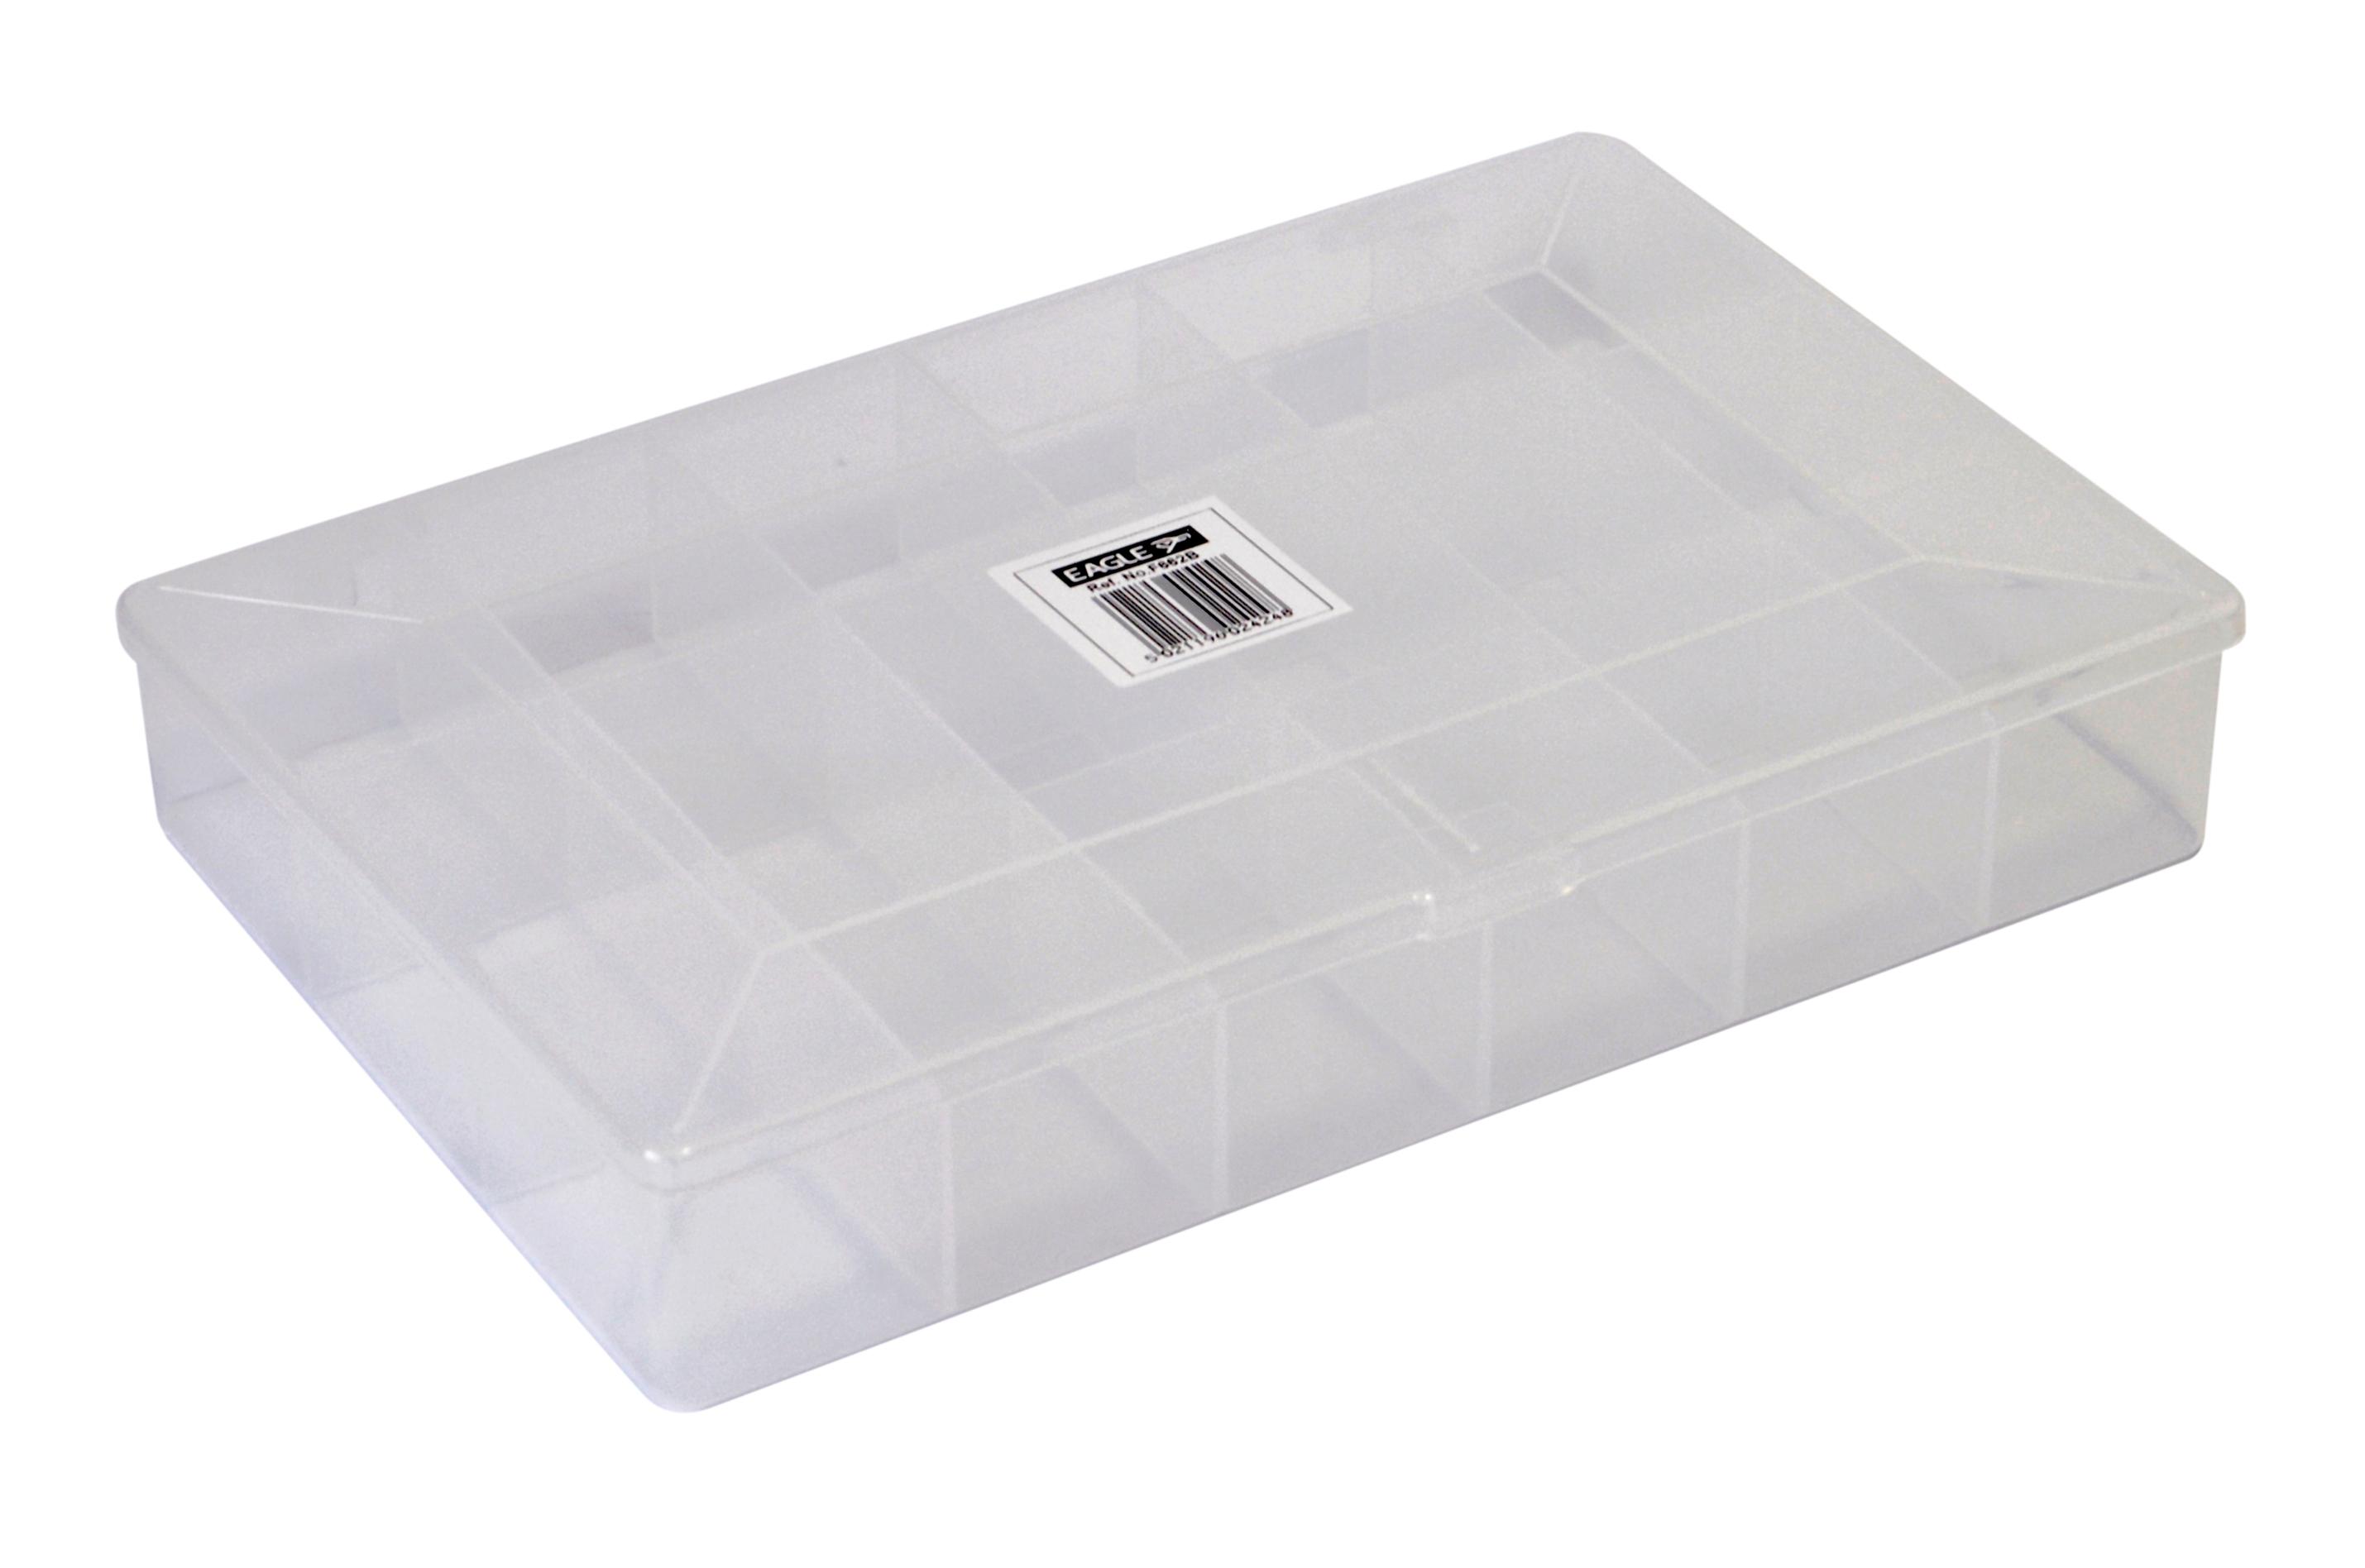 18 compartment crafts plastic storage case box white ebay for Craft storage boxes with compartments